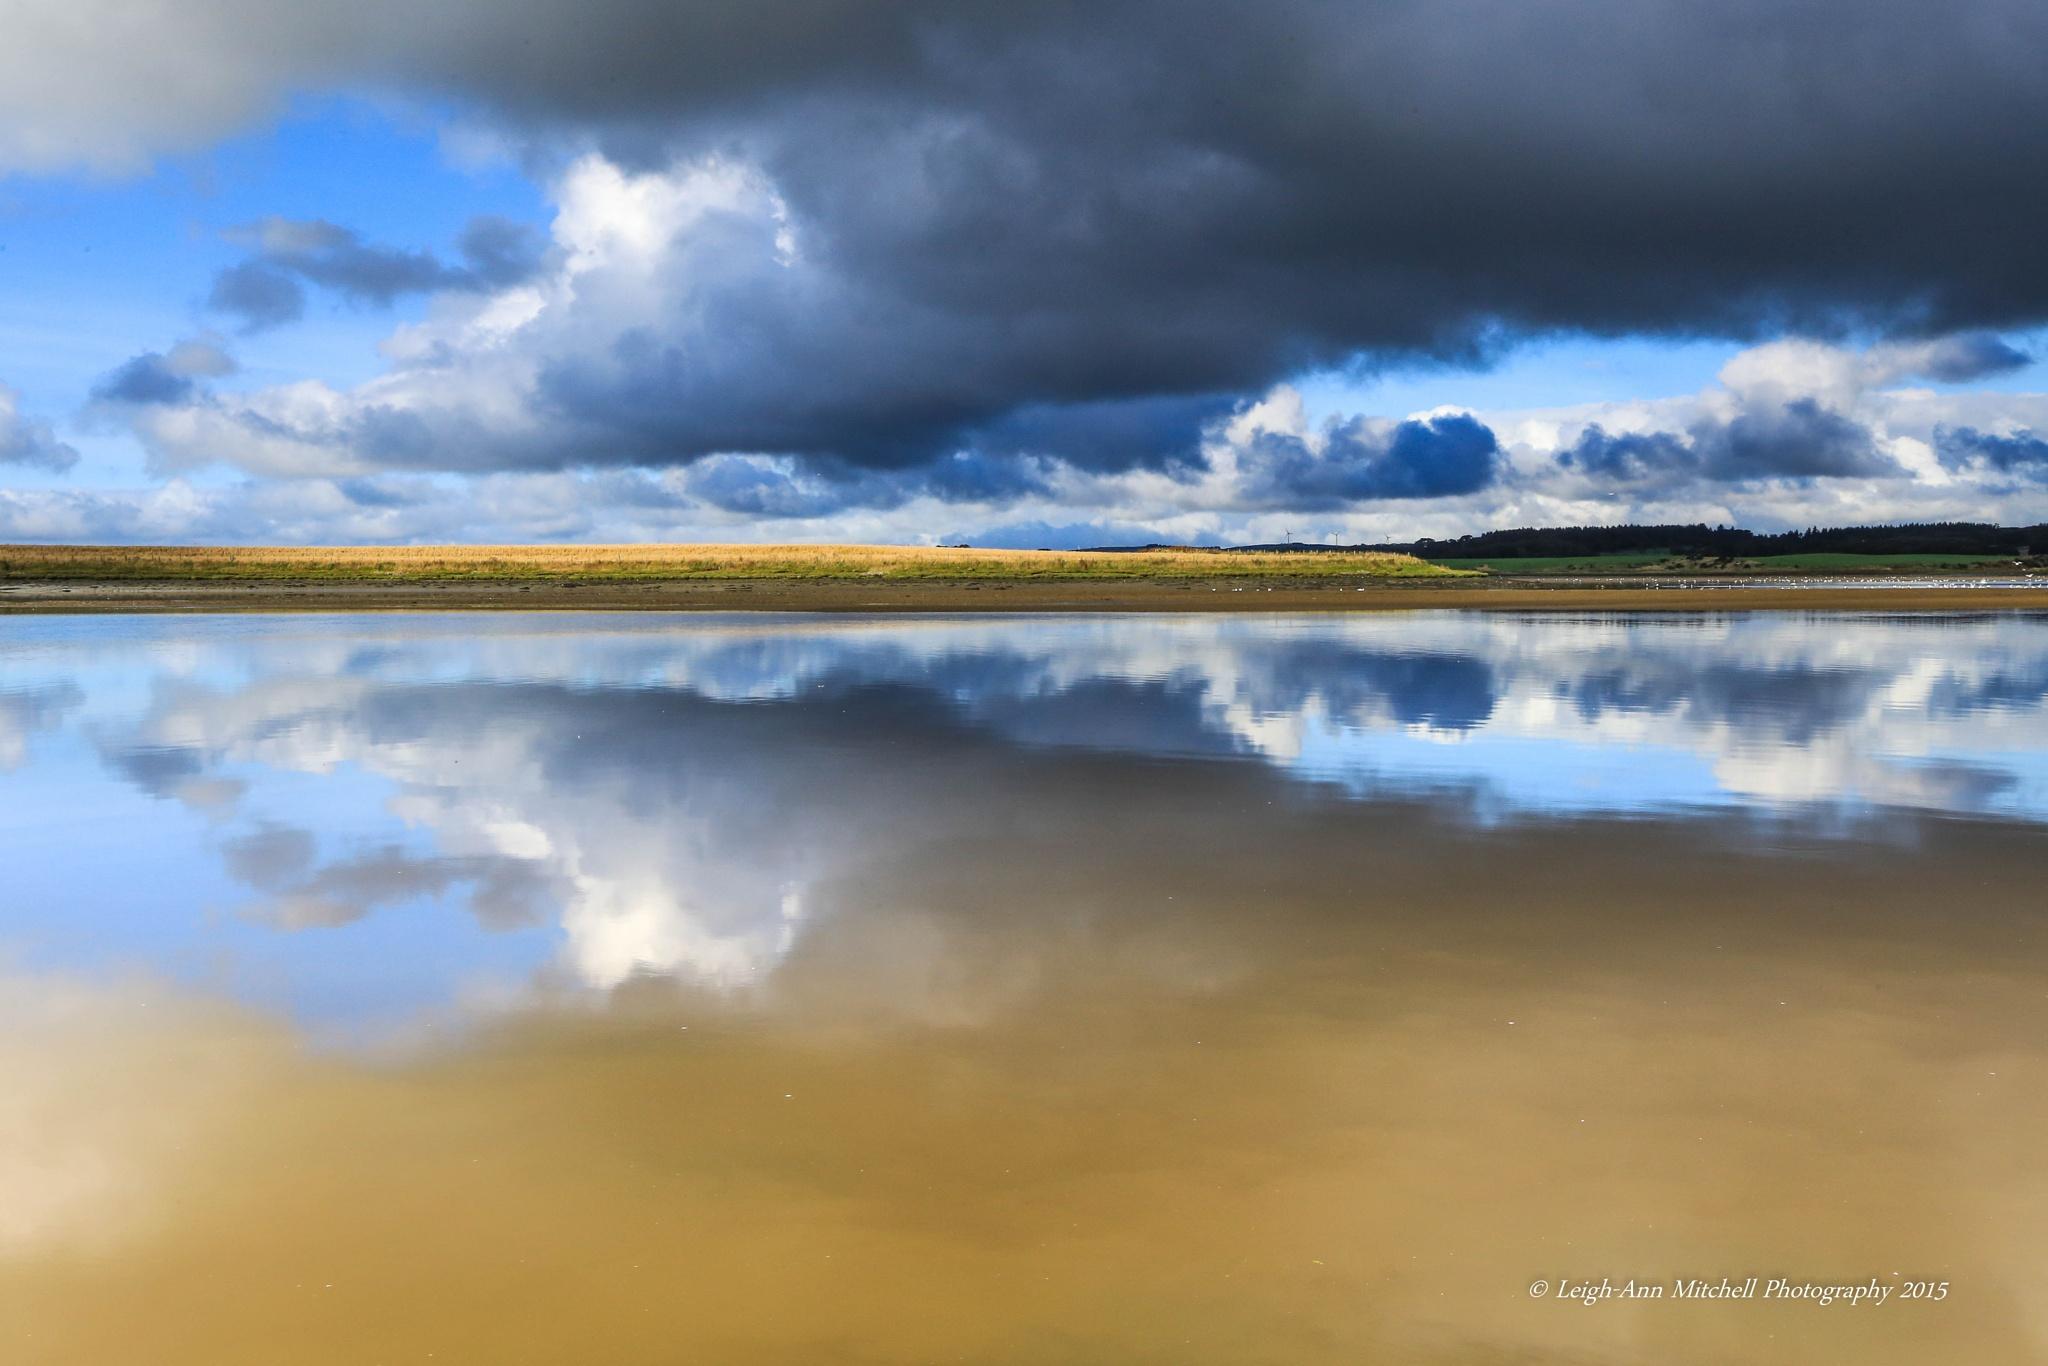 SHADES OF BLUE by Leigh-Ann Mitchell